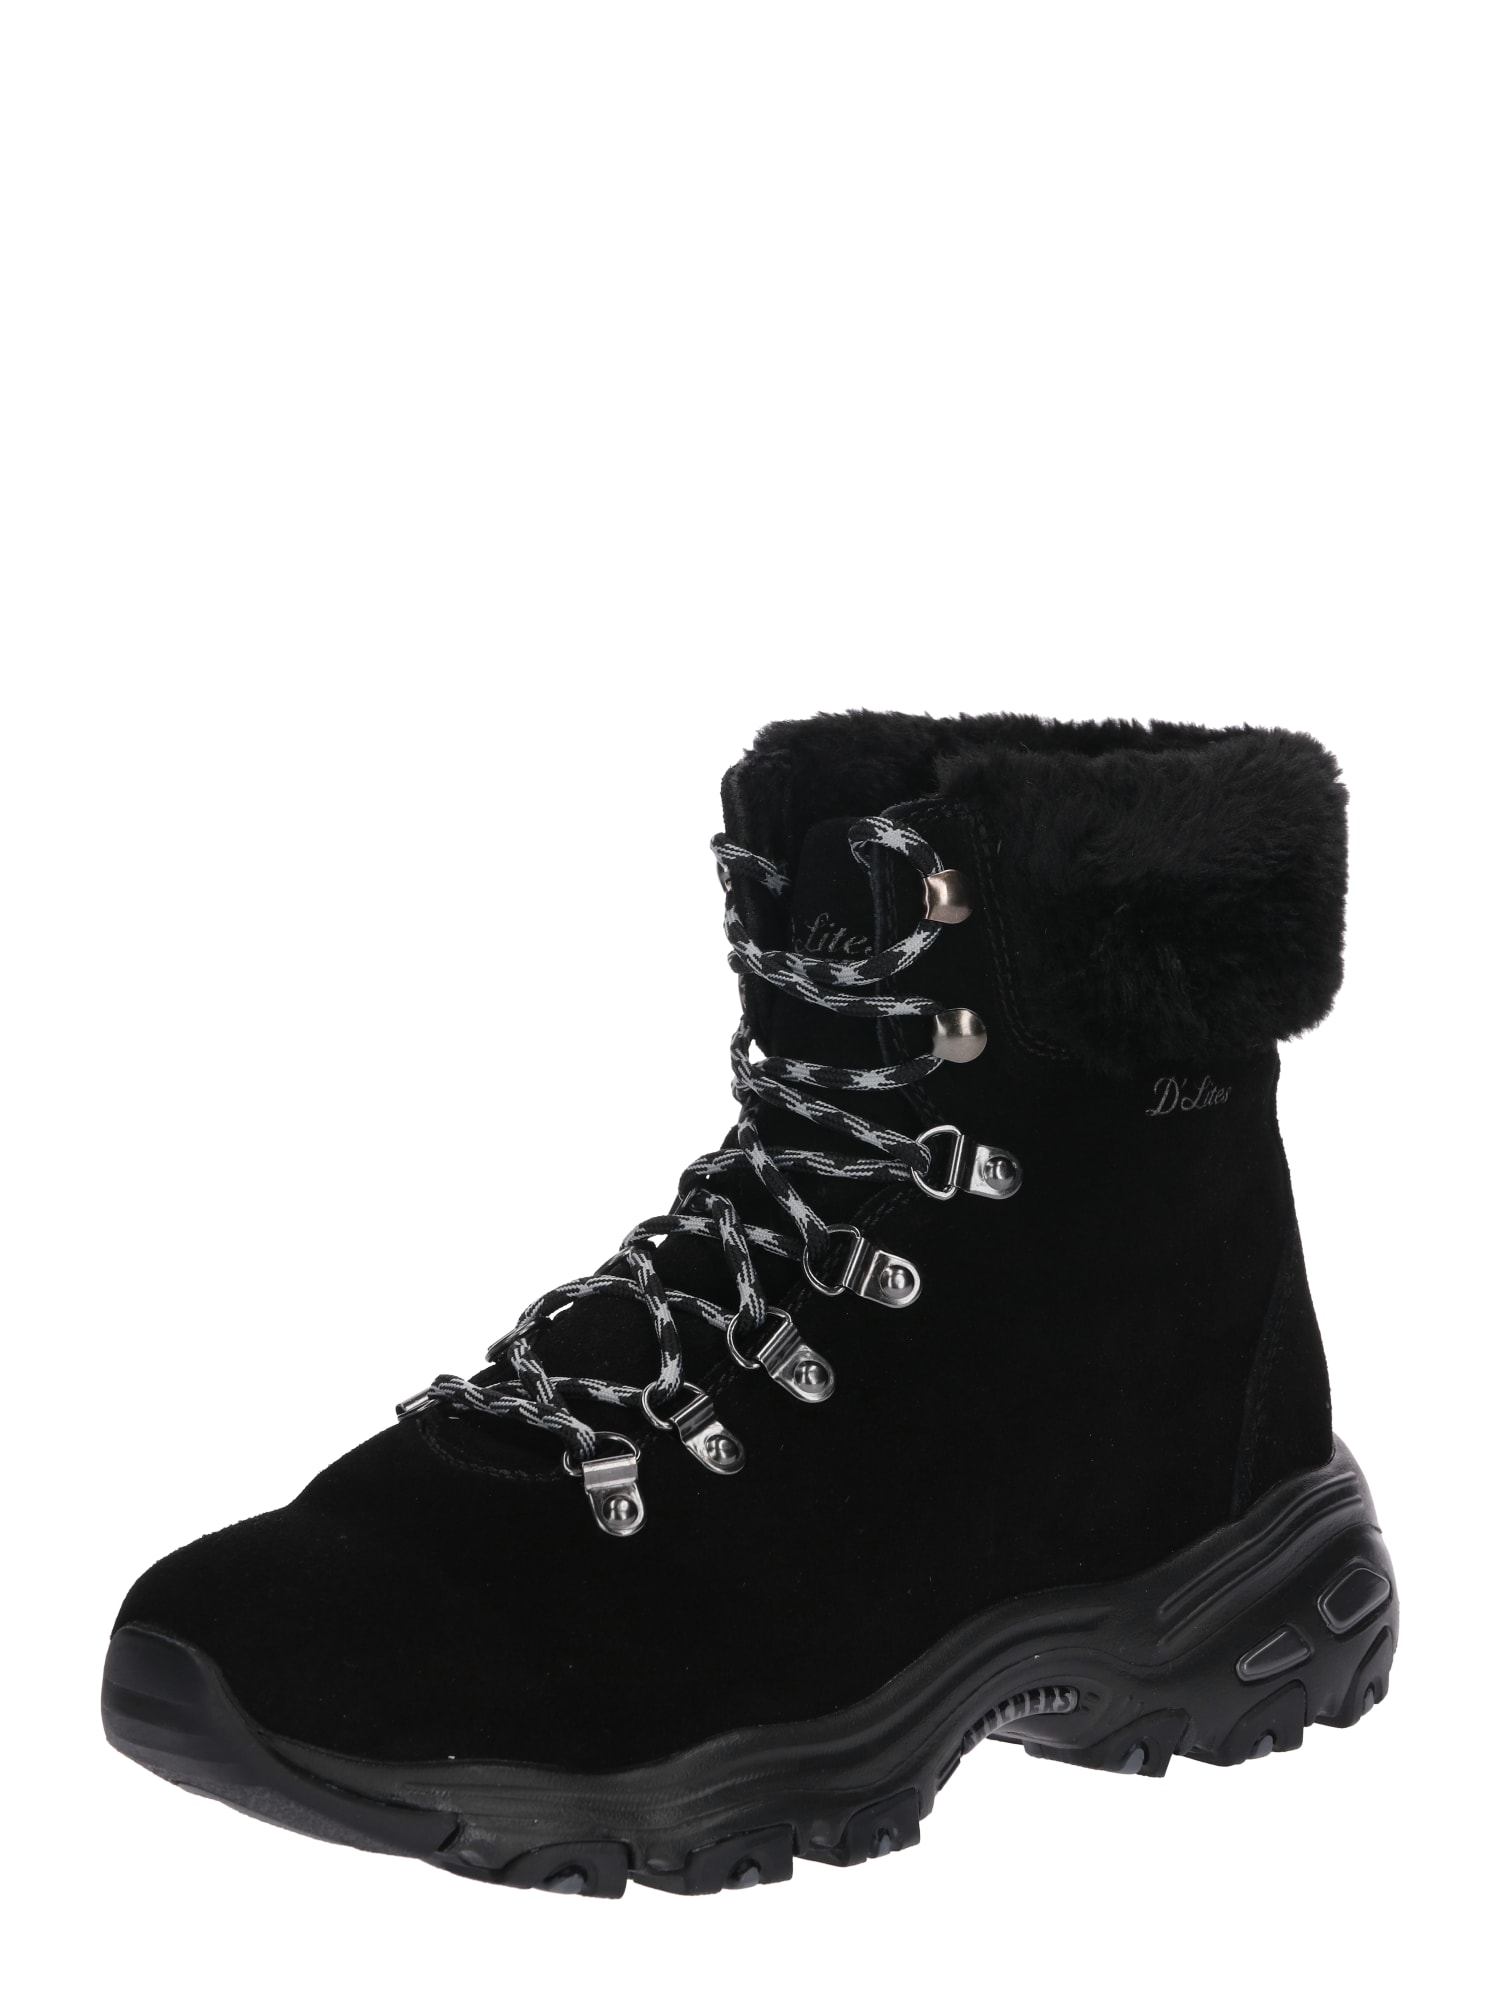 SKECHERS, Dames Snowboots 'D'LITES', zwart